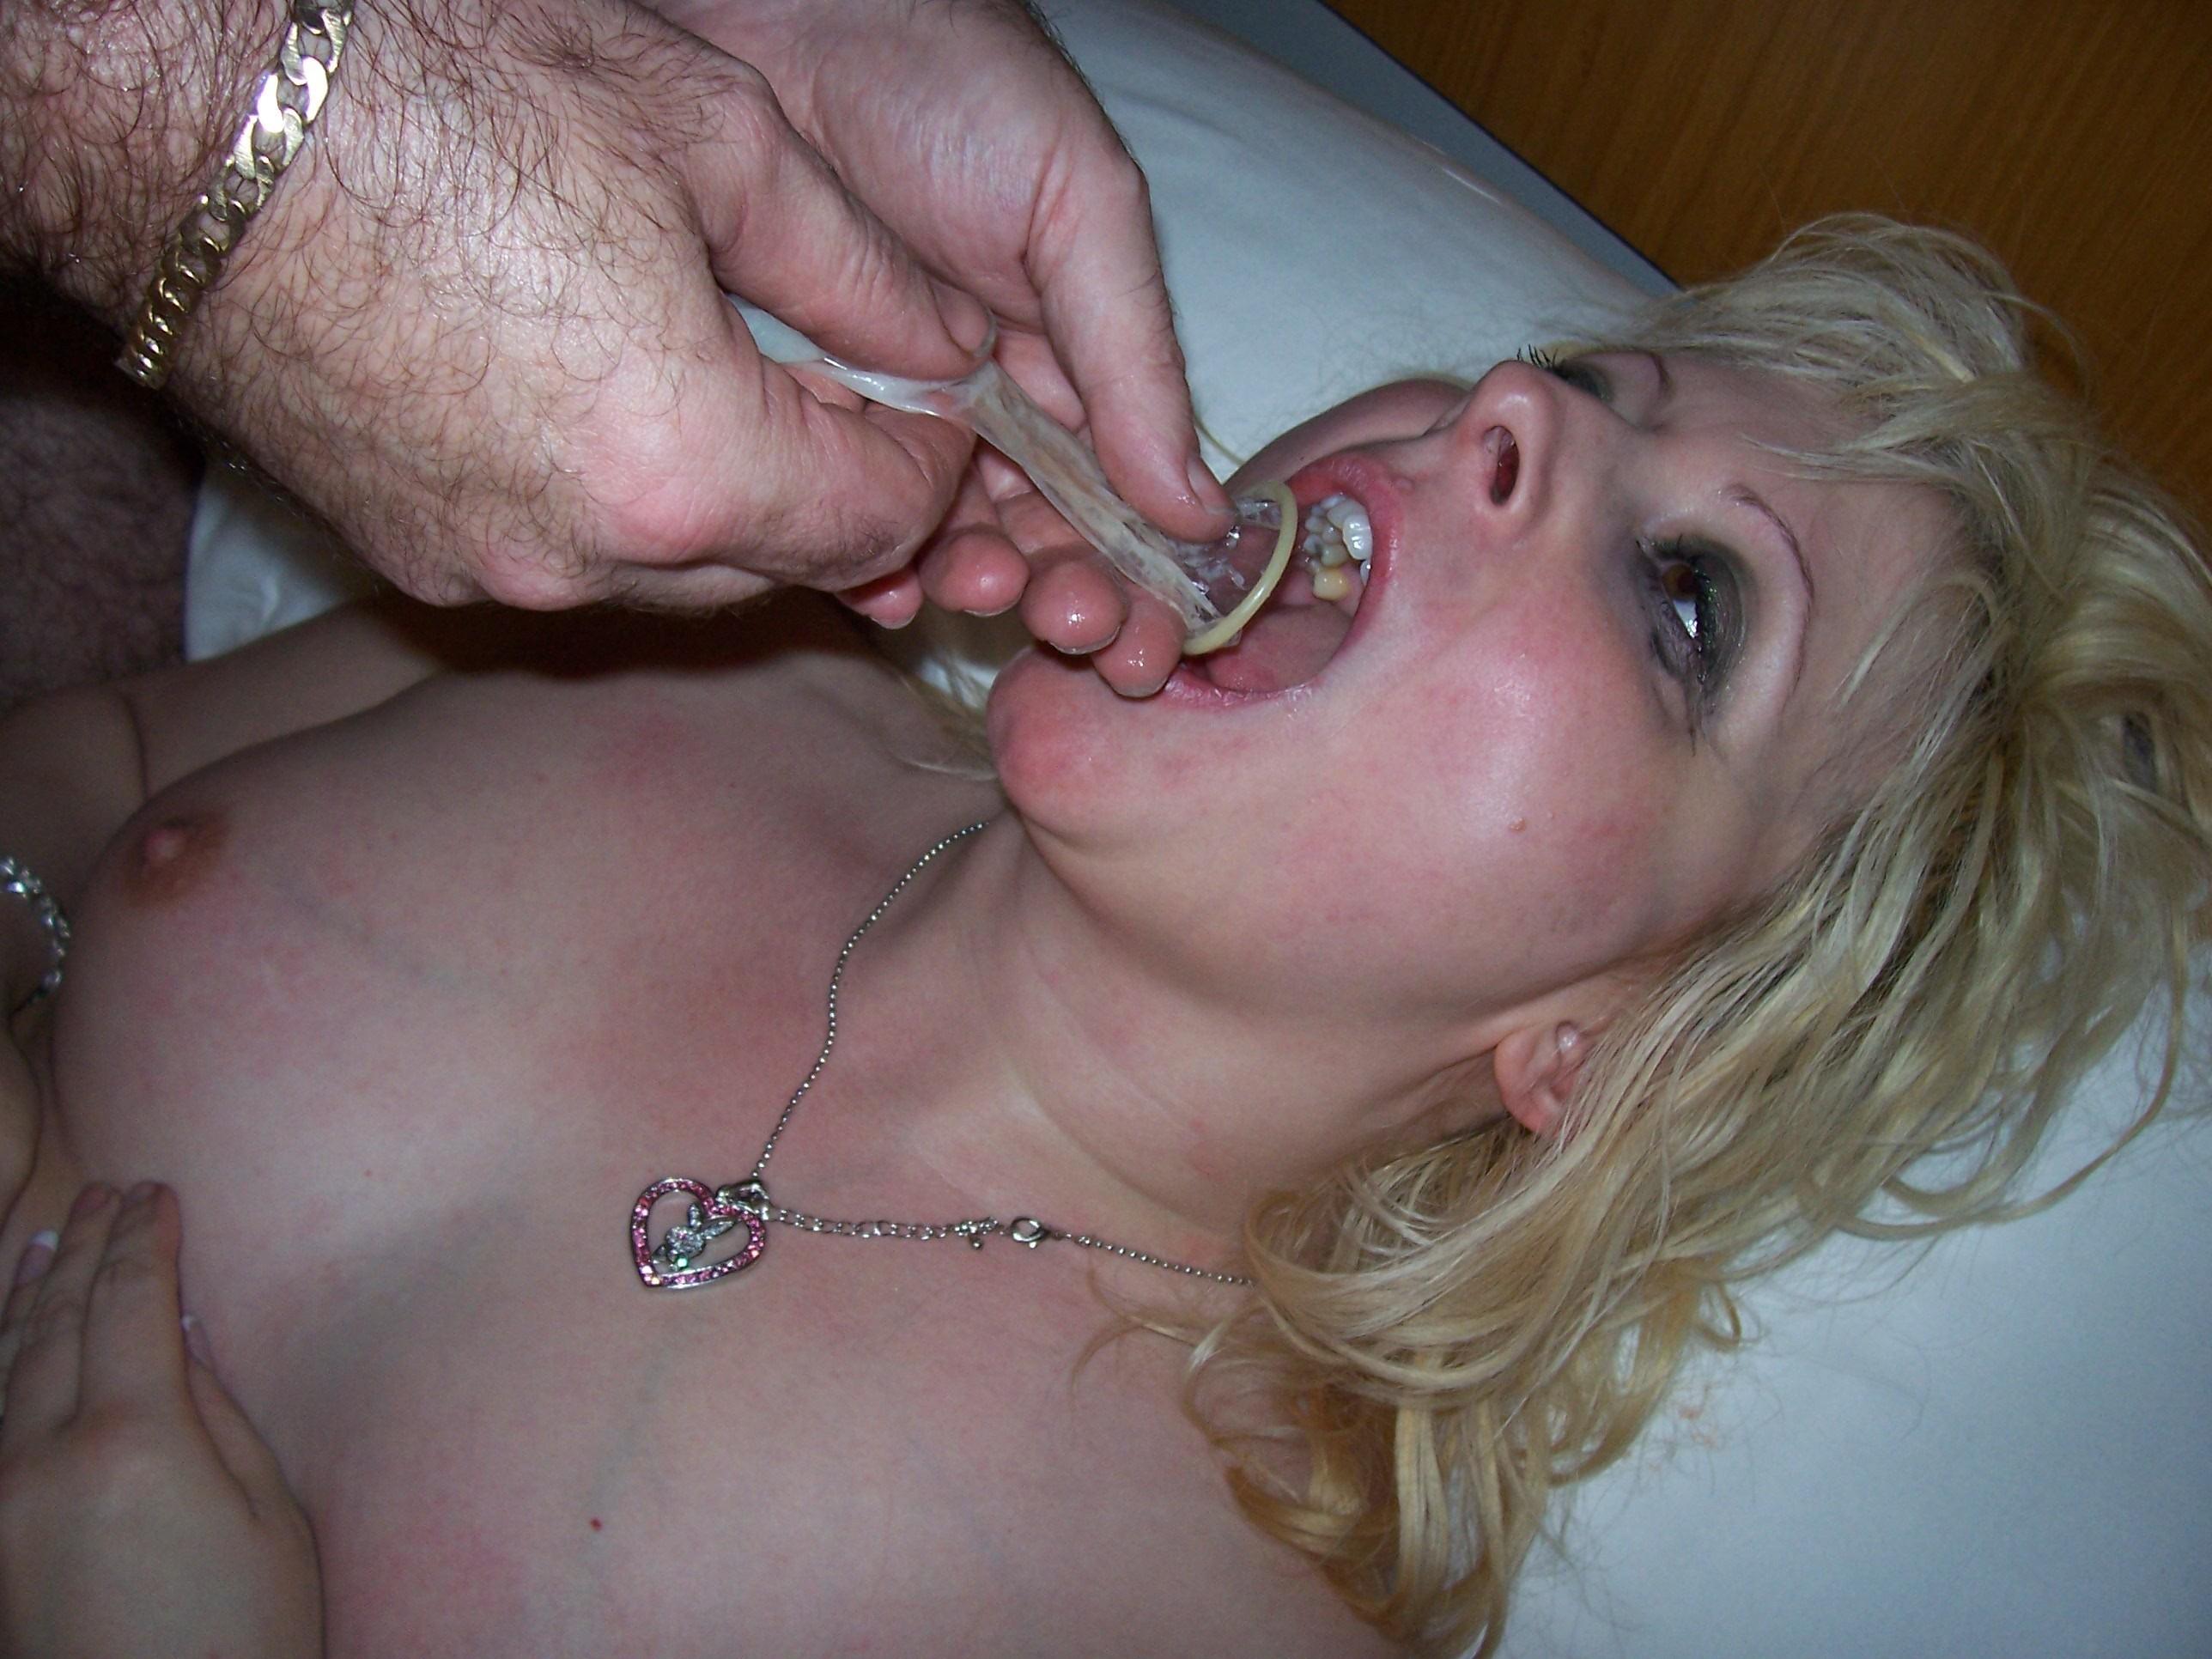 Wife cum drinker